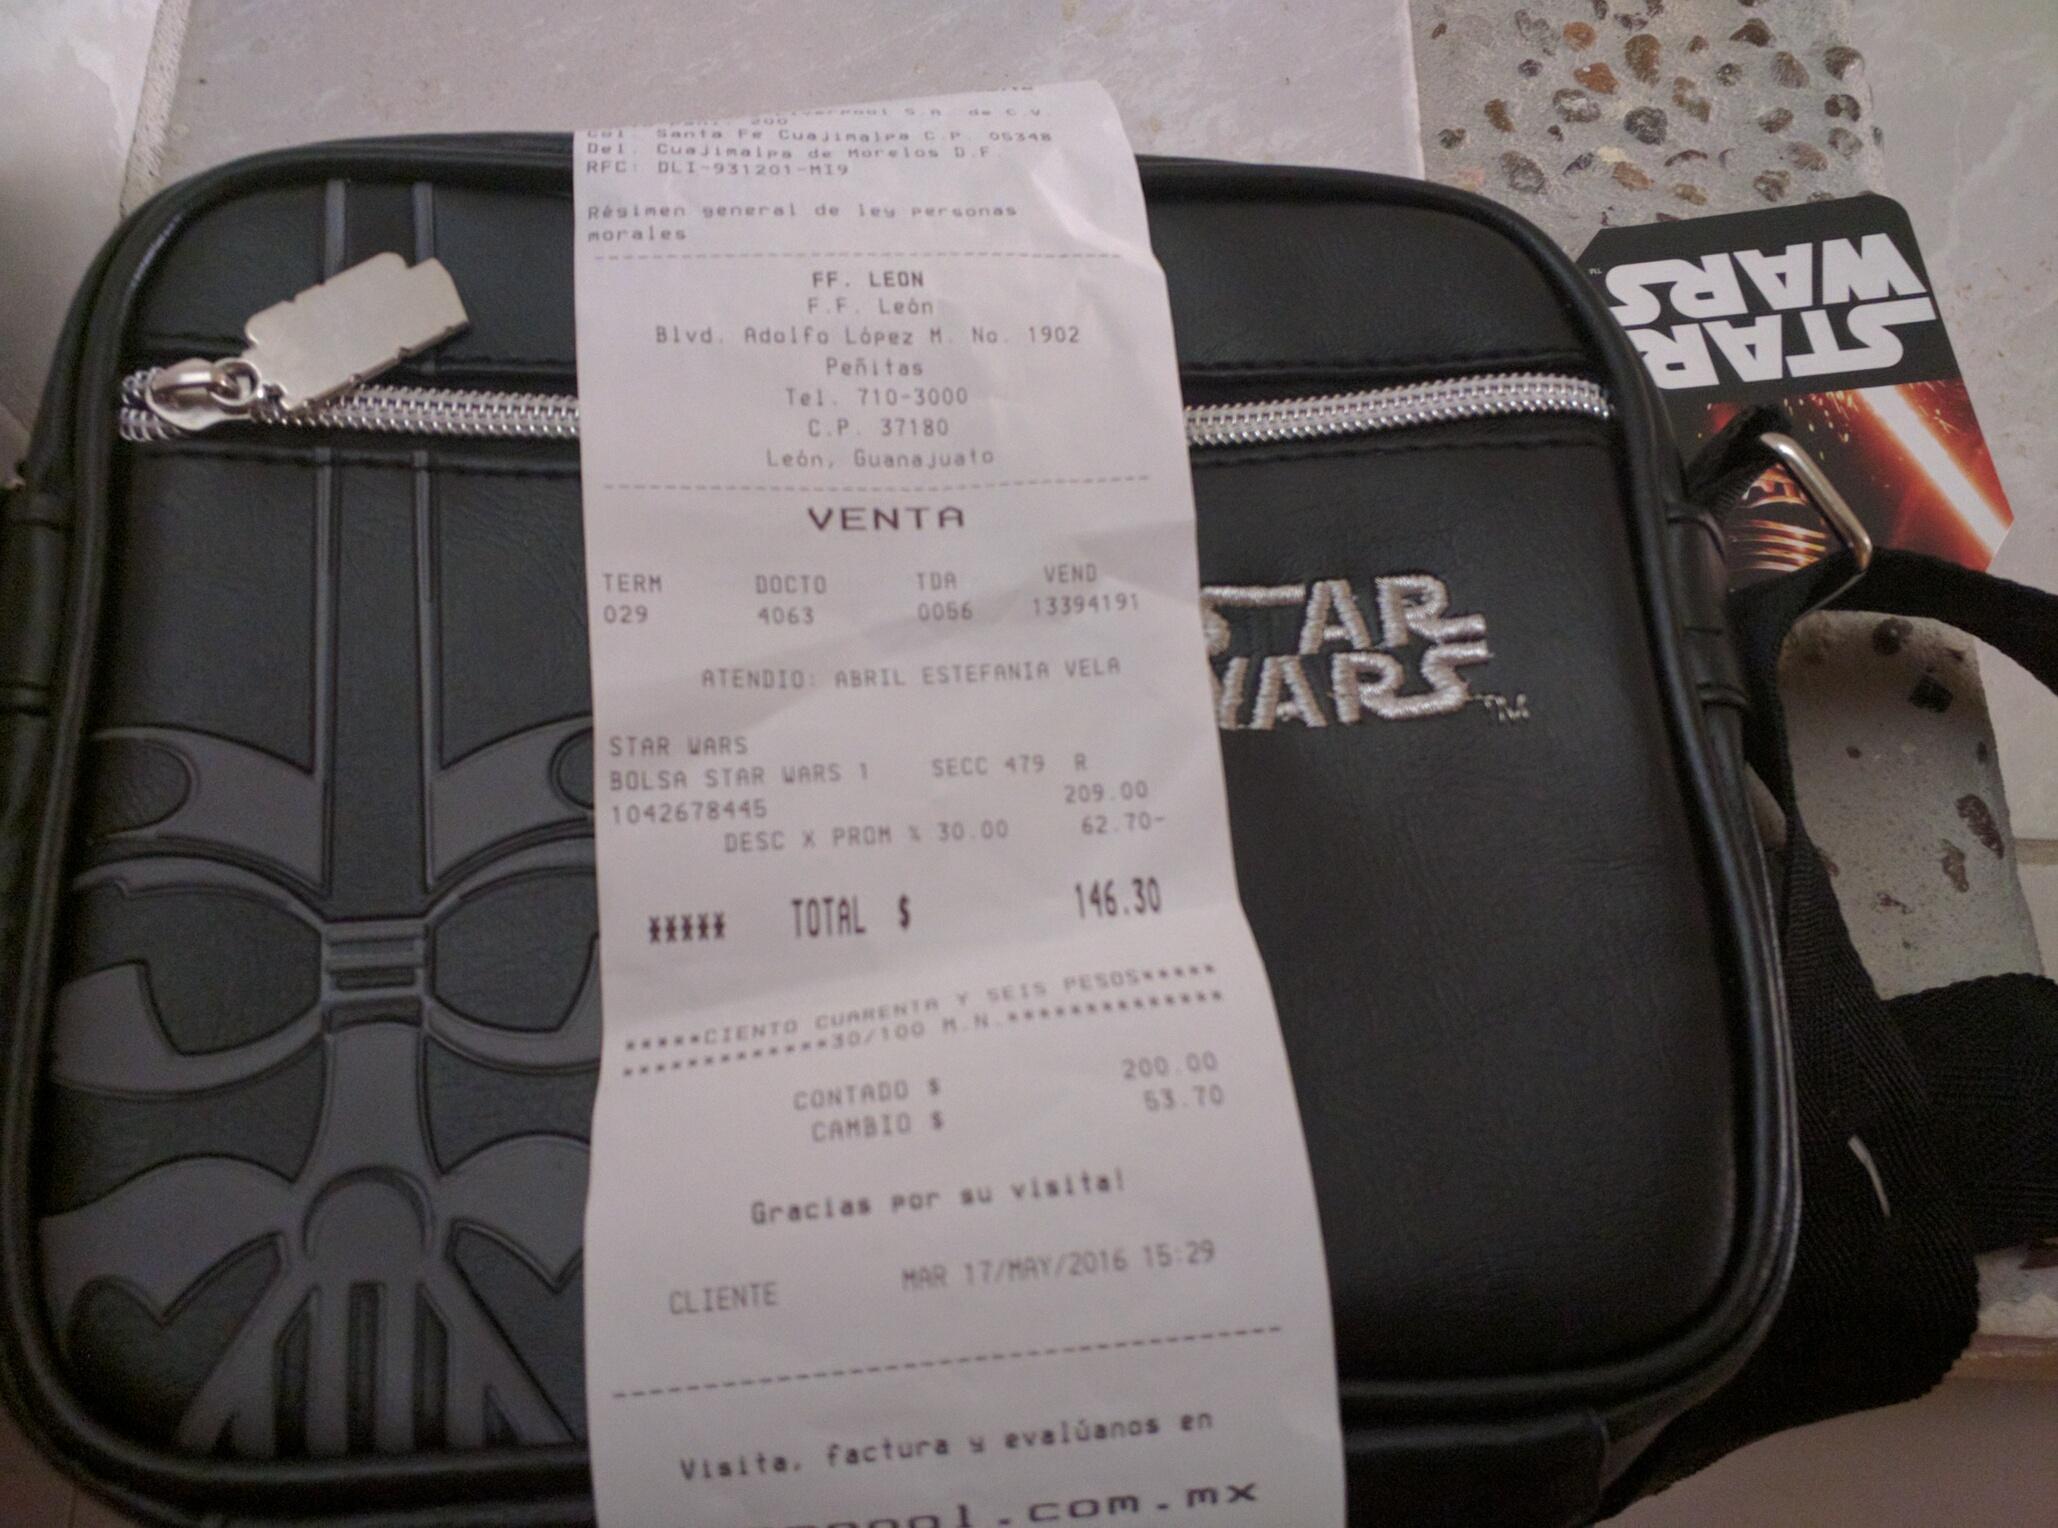 Fabricas de Francia: Bolsa Star Wars tipo cangurera-mariconera a $146